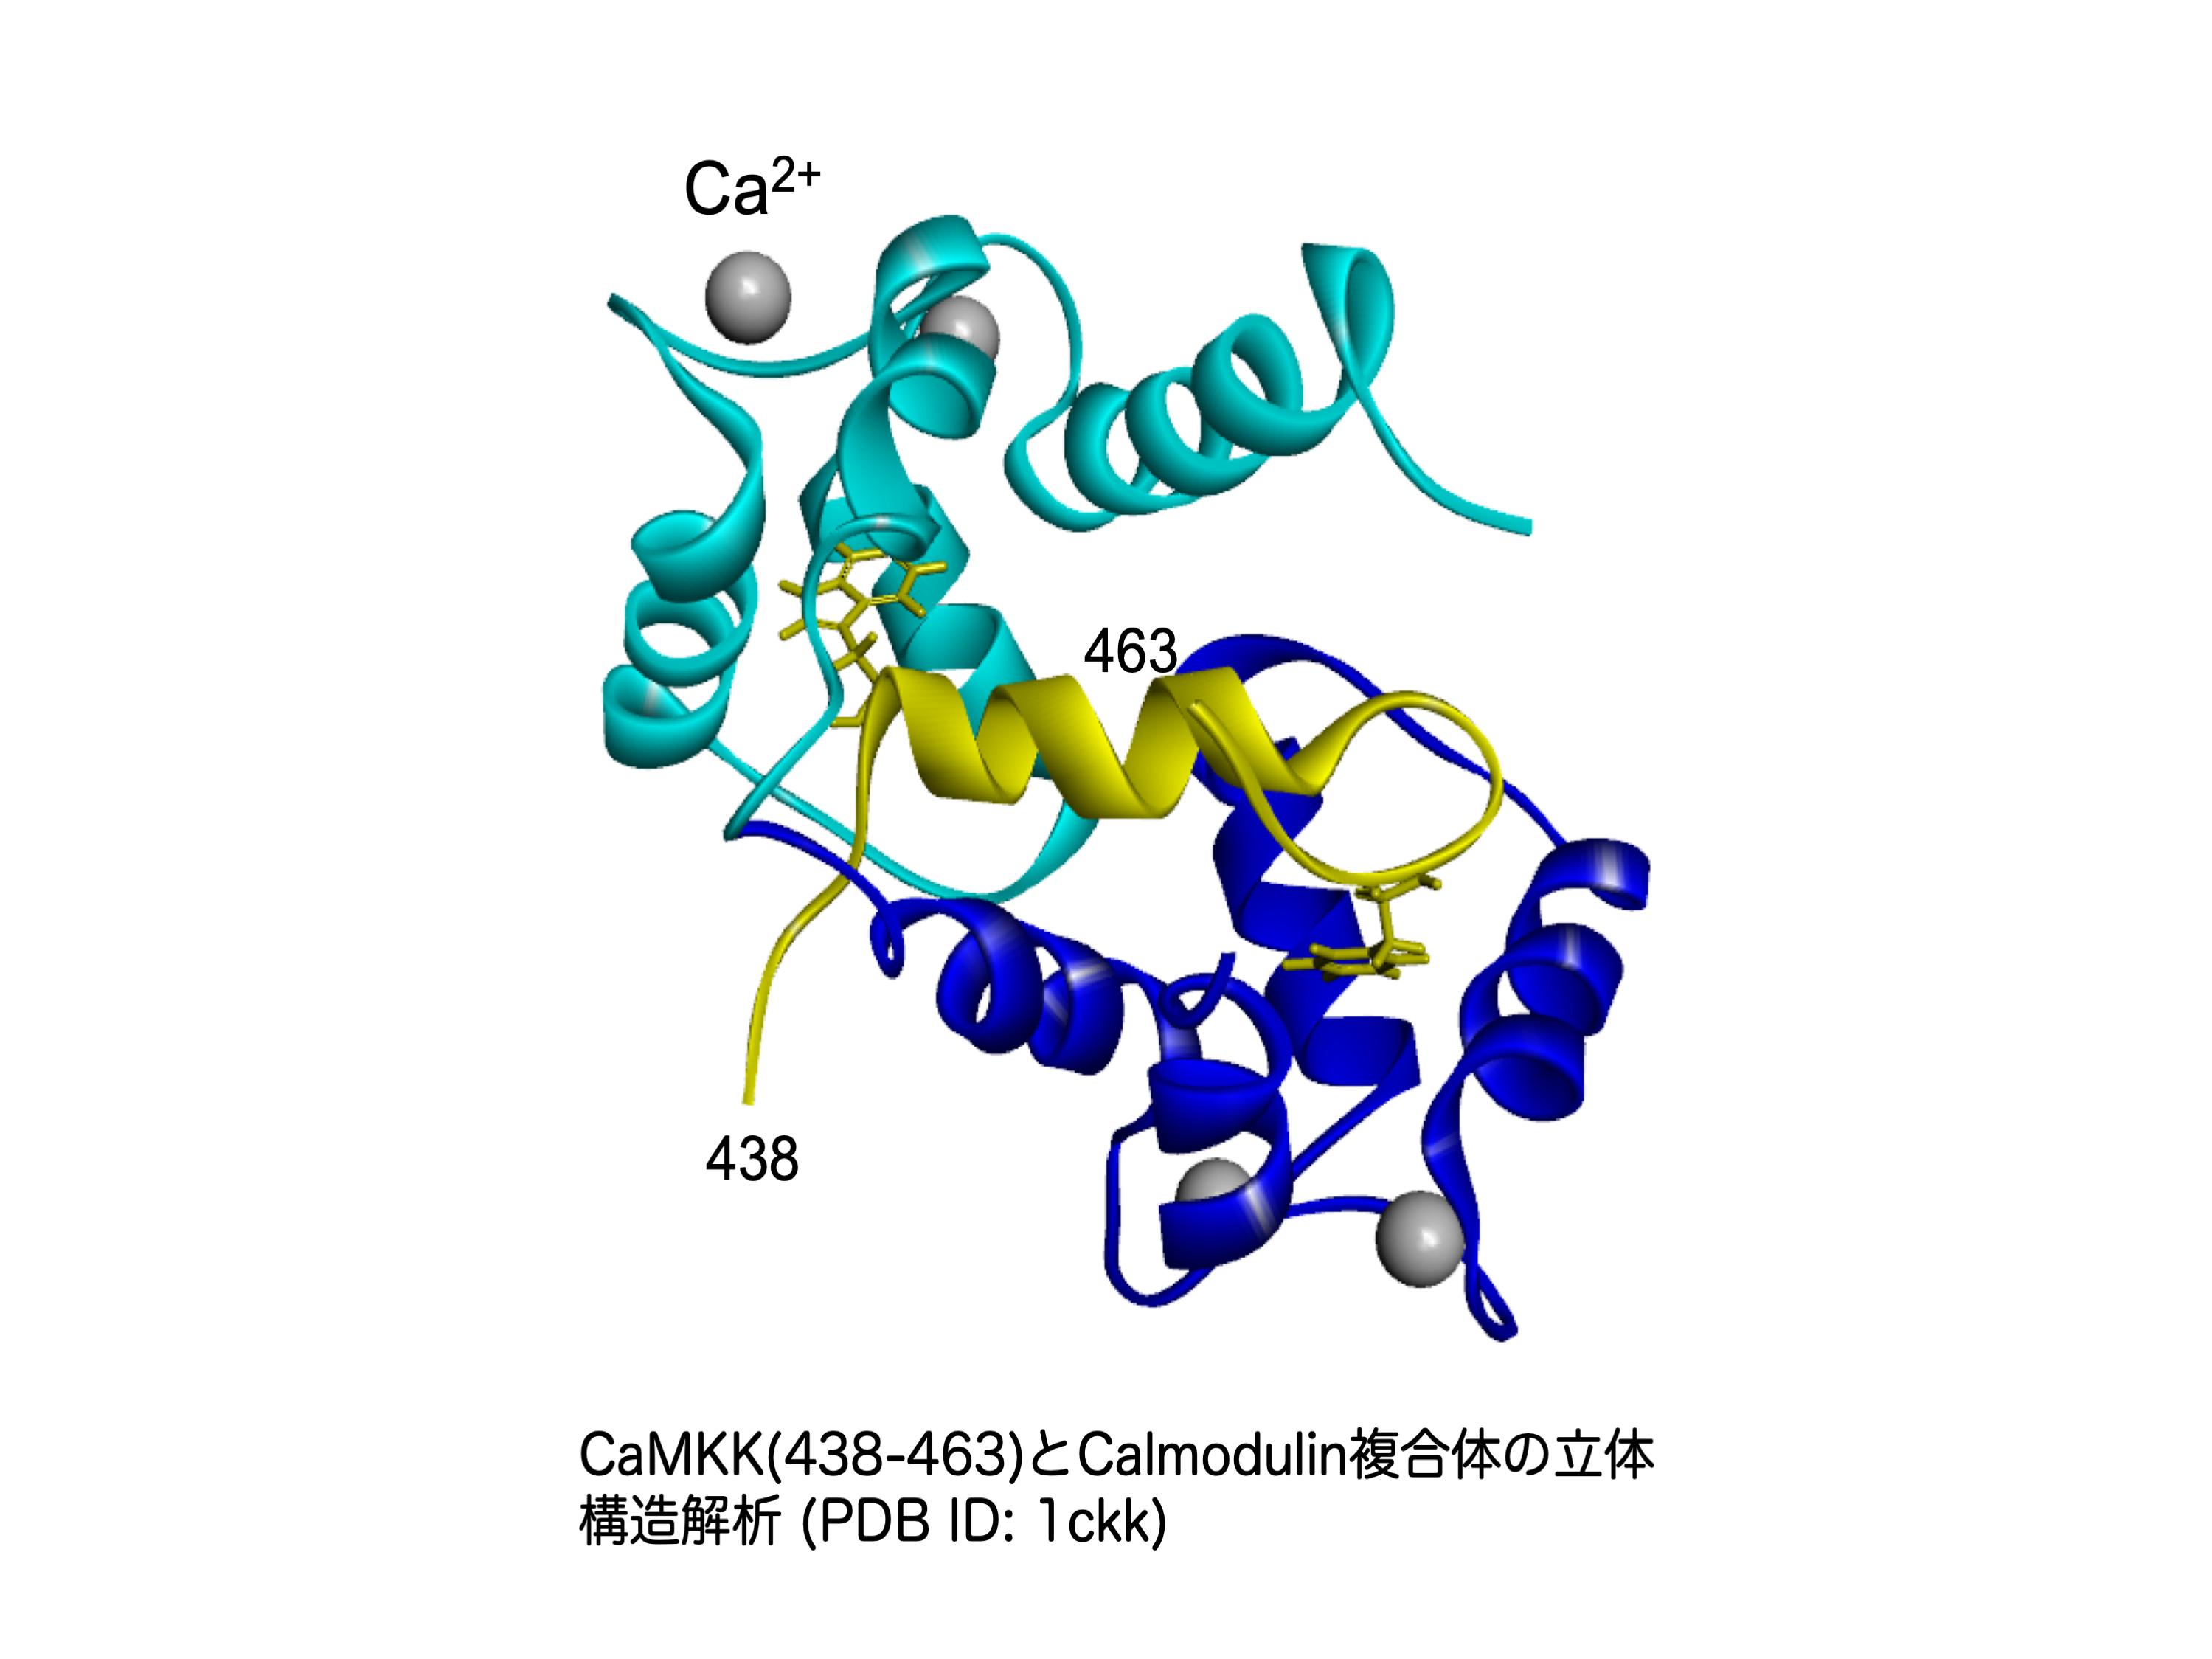 Calmodulin依存性タンパク質リン酸化酵素の構造と機能研究